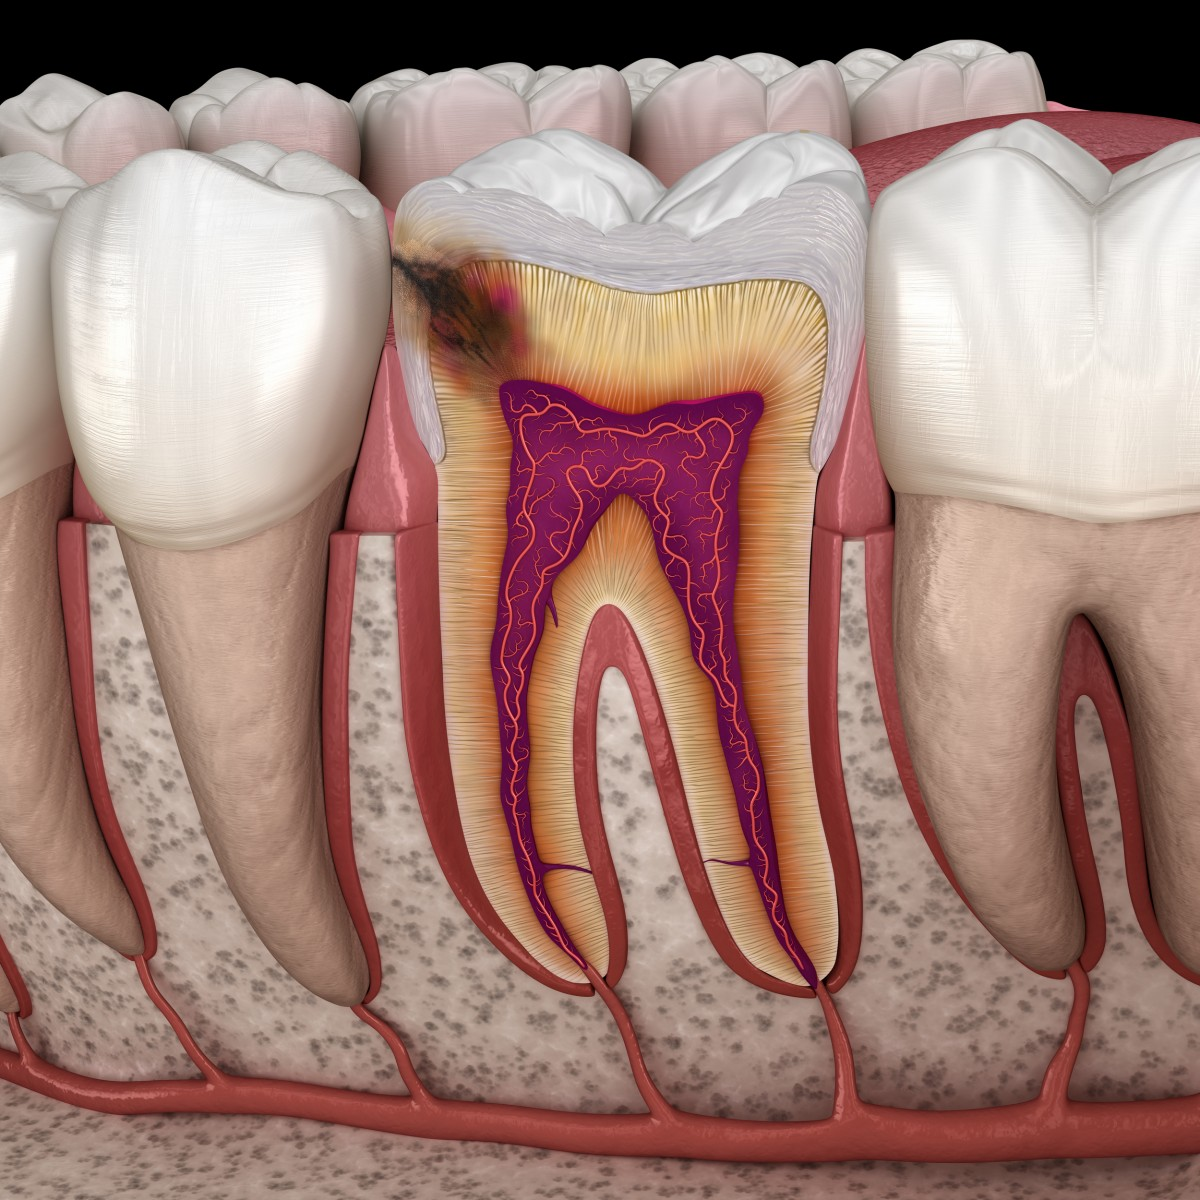 endodontie tragoviste